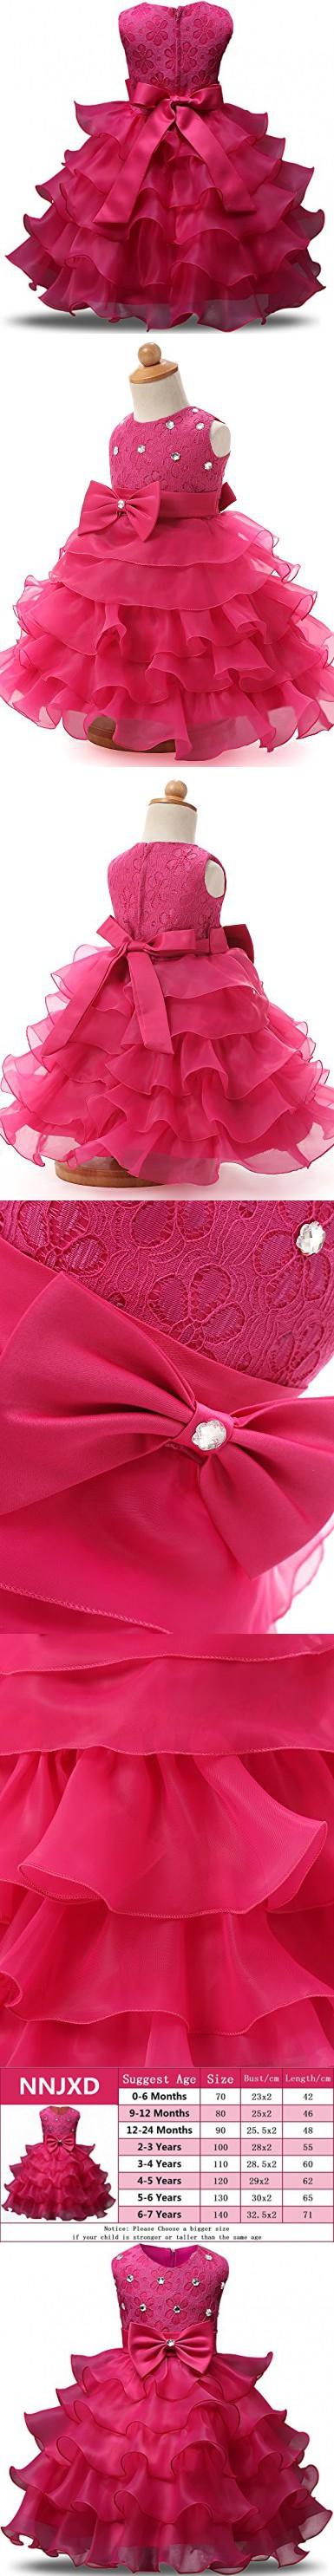 ae5baeceb0e2 Rorychen Baby Girls  Sleeveless Lace Zipper Dress 9 Months Pink ...